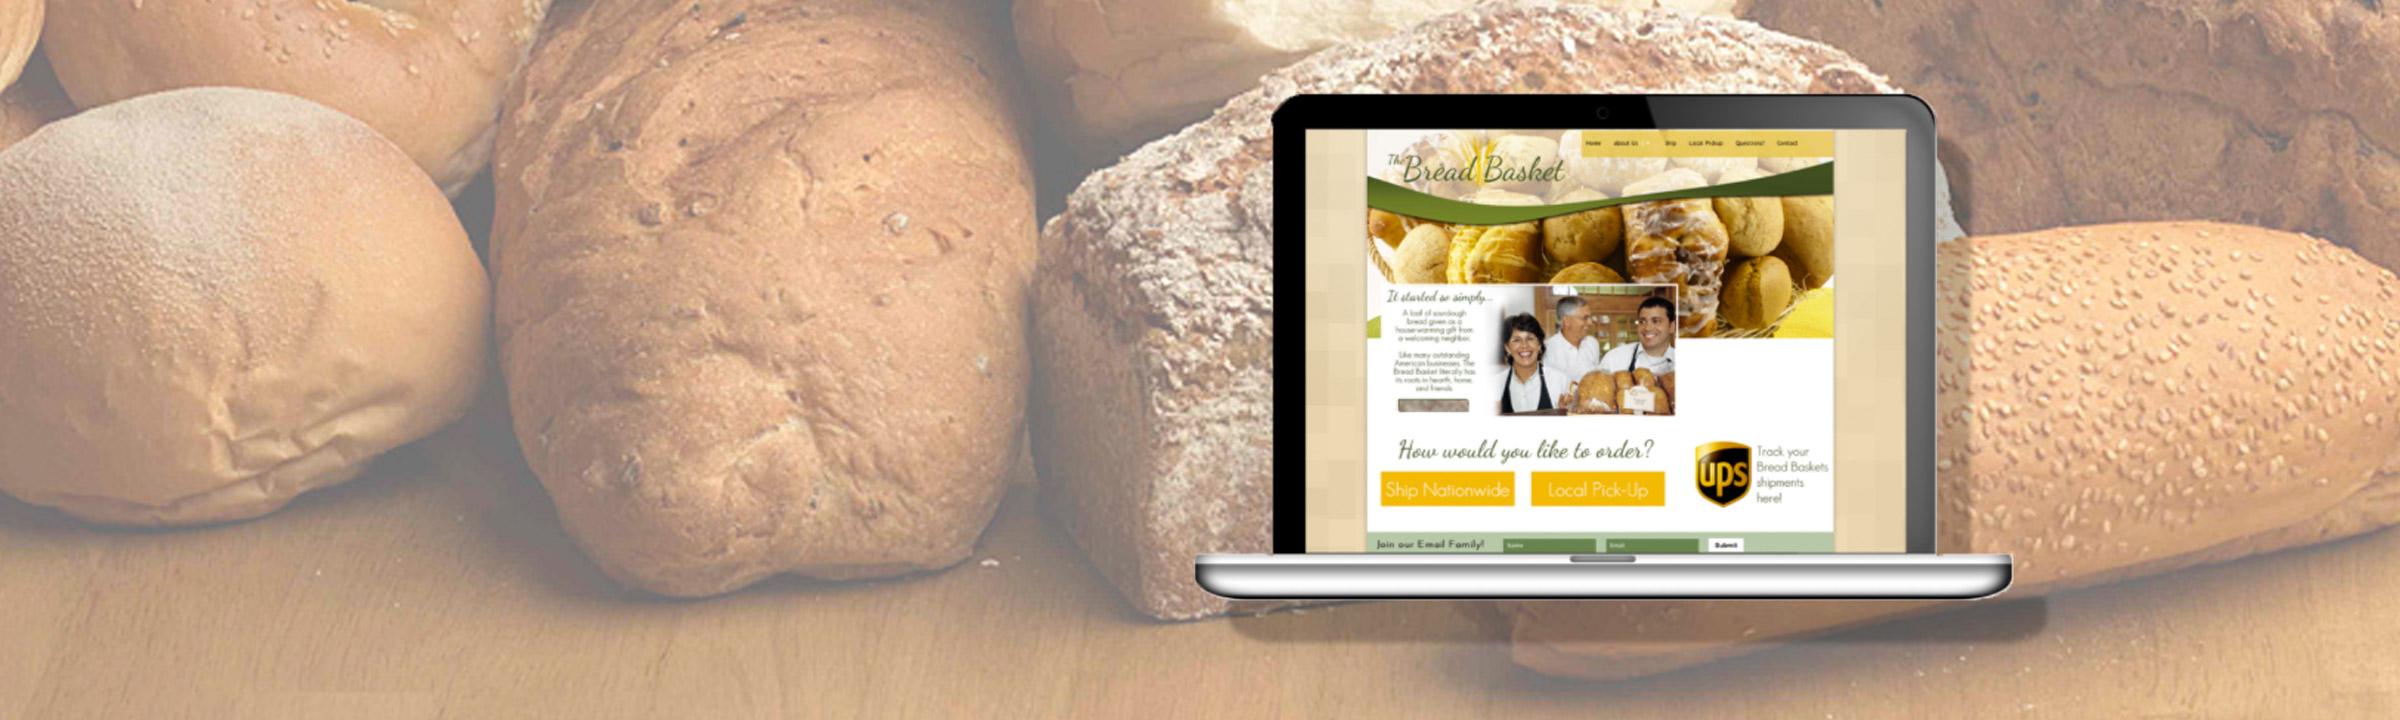 HP-breadbasket-2400x720